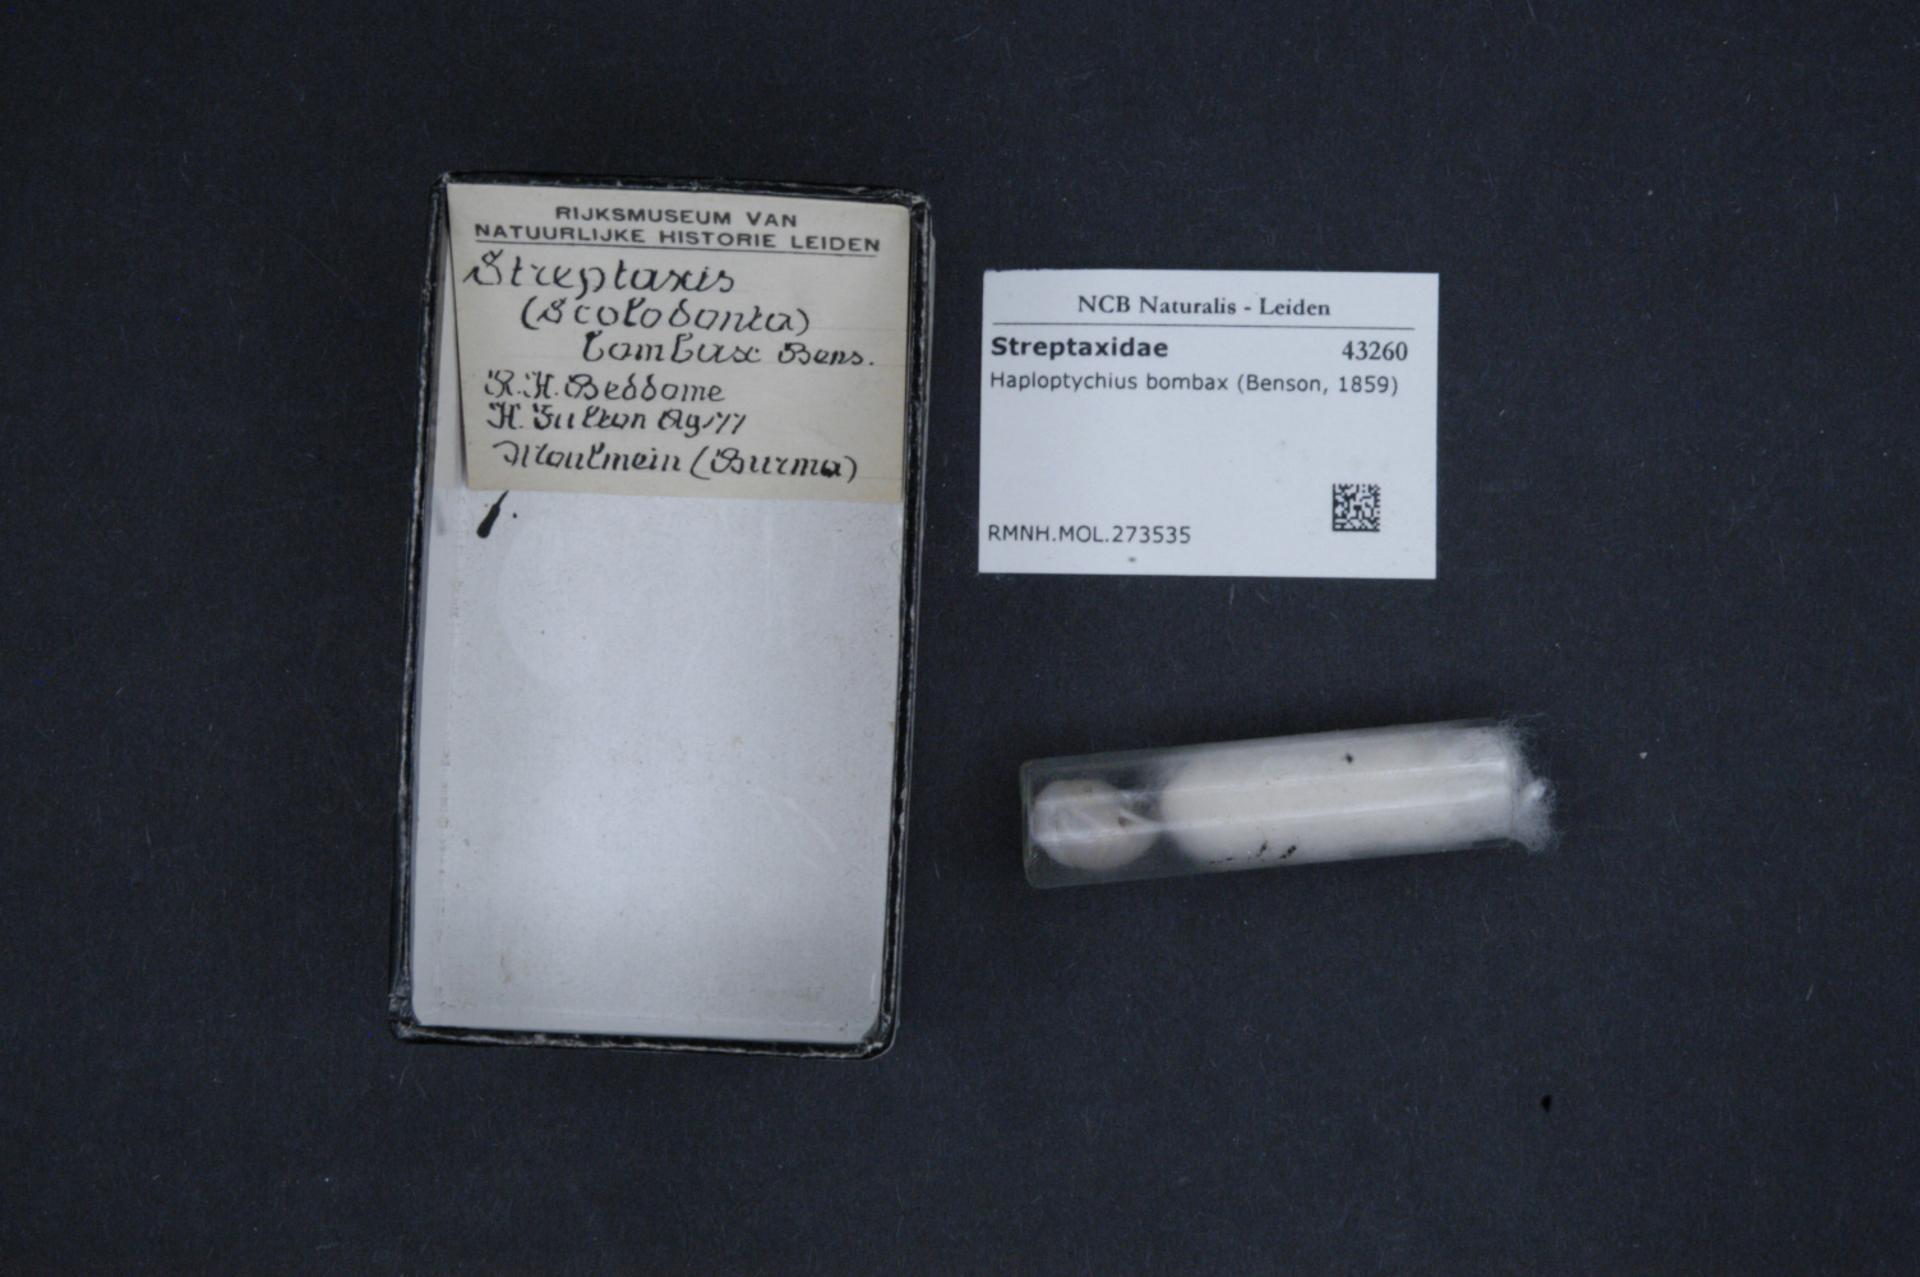 File:Naturalis Biodiversity Center - RMNH MOL 273535 - Haploptychius